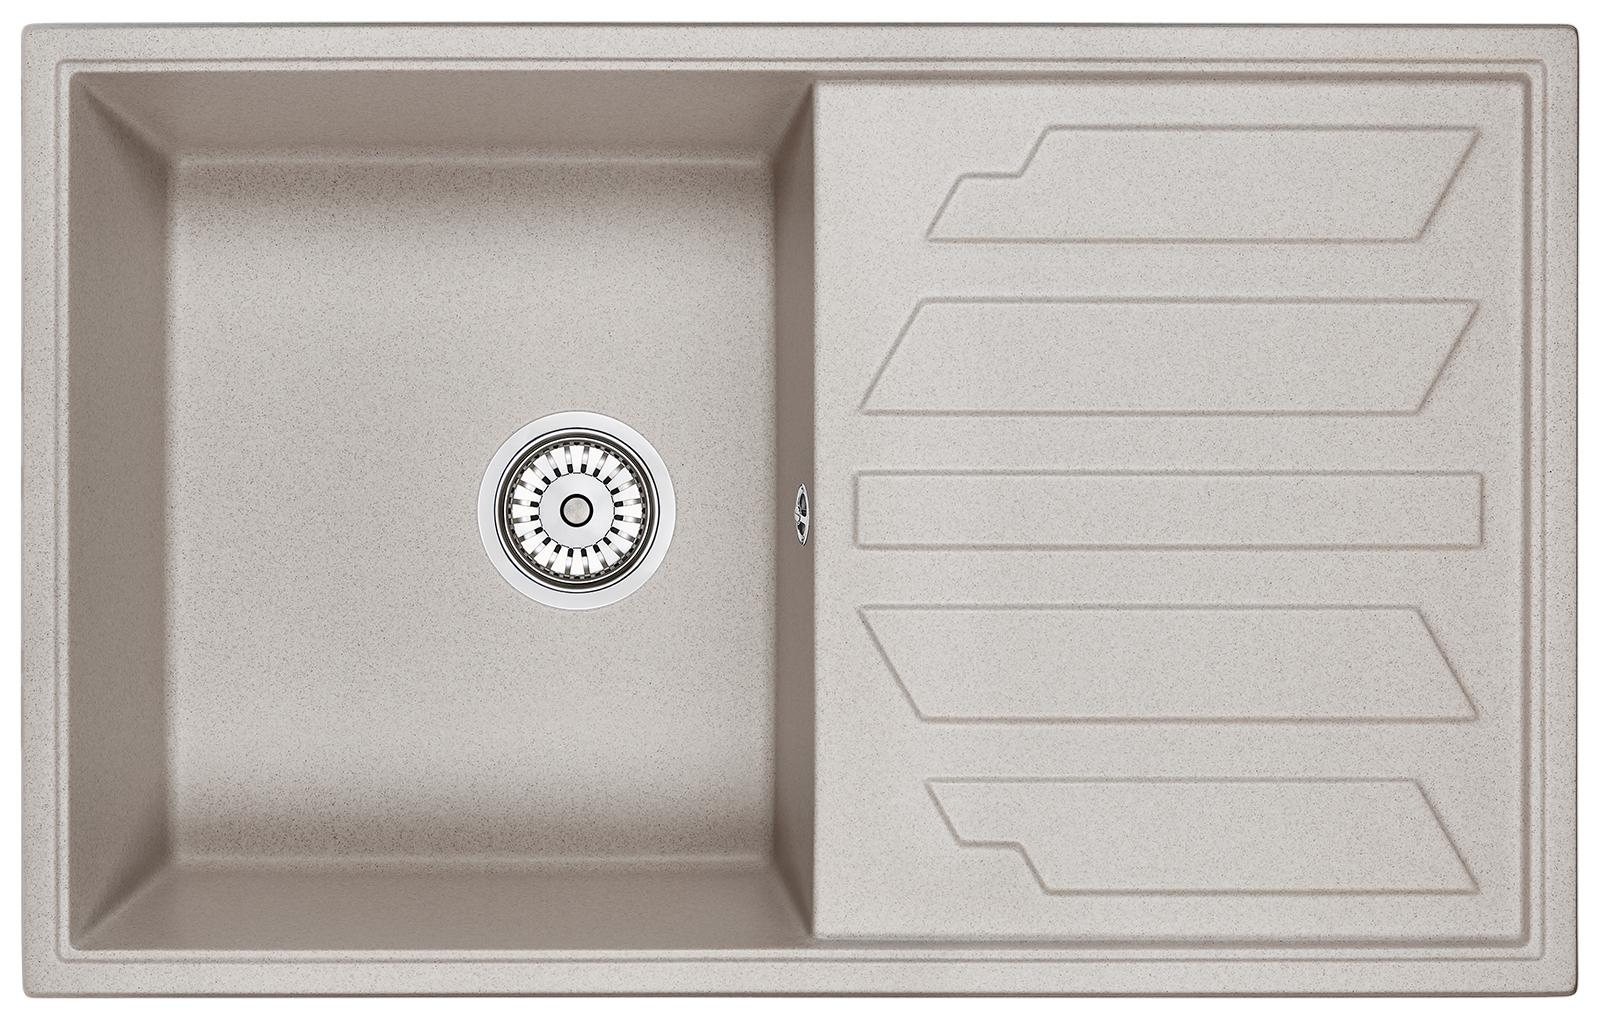 Мойка кухонная Granula Gr-8002 кухонная мойка granula 4201 классик